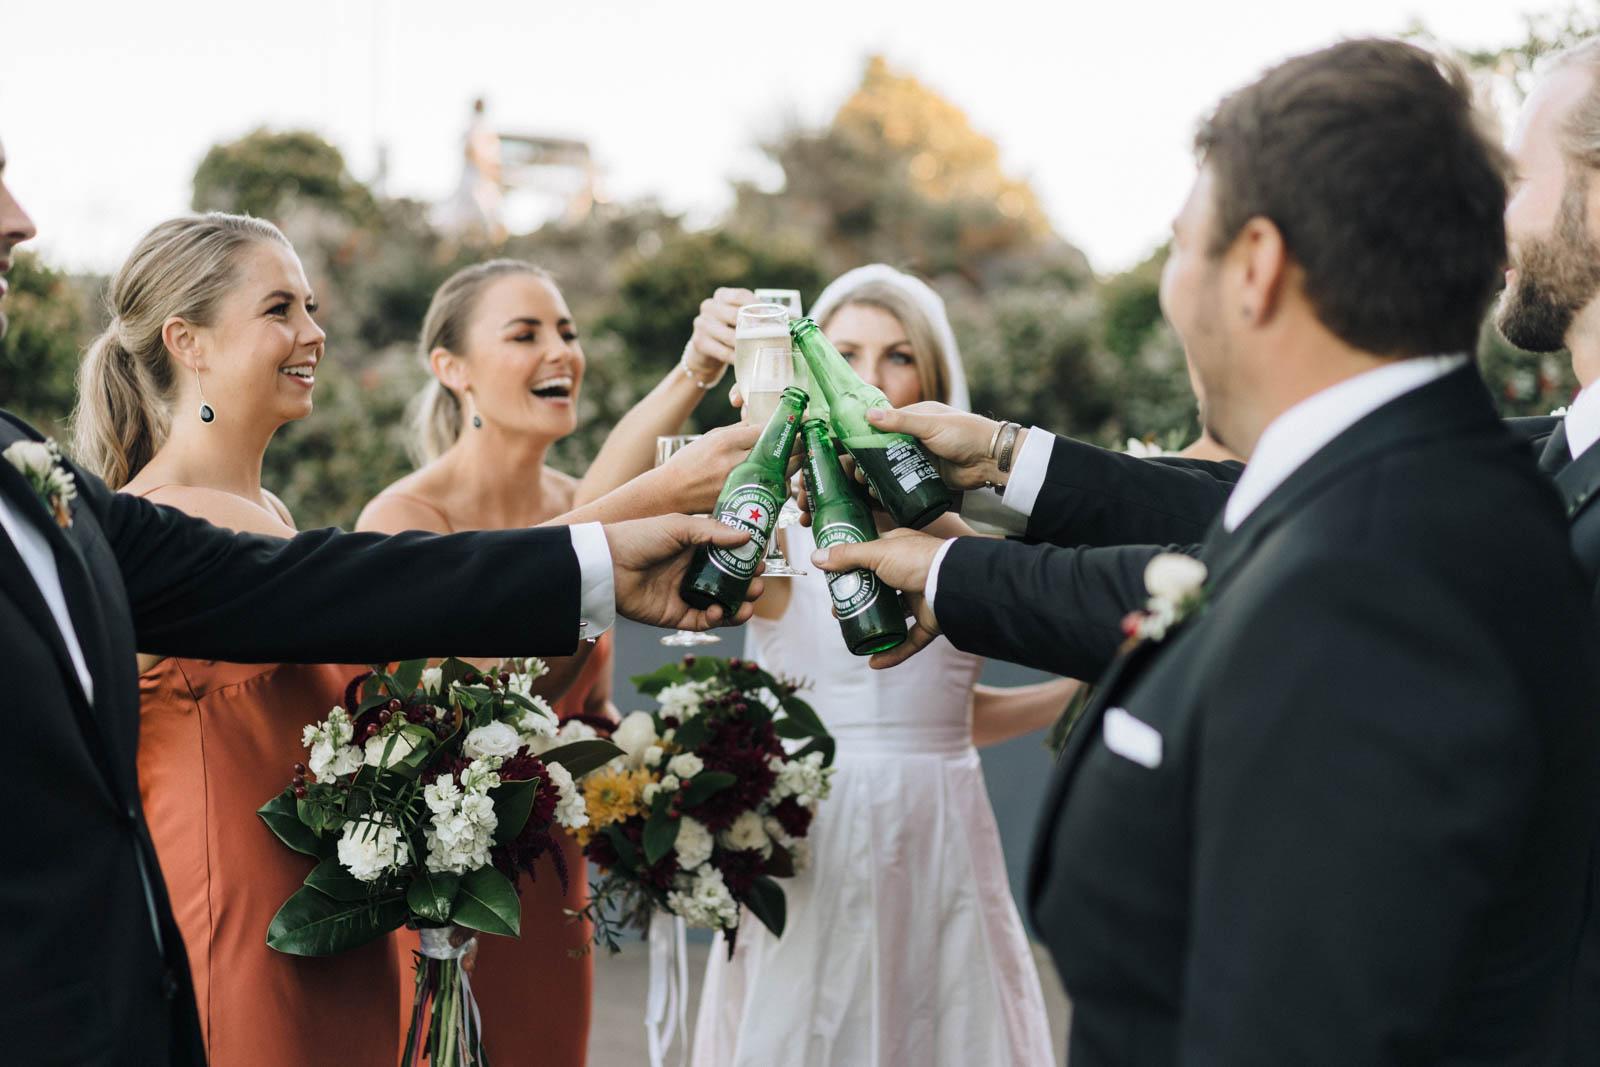 newfound-s-p-mt-maunganui-tauranga-wedding-photographer-1748-A9_07135